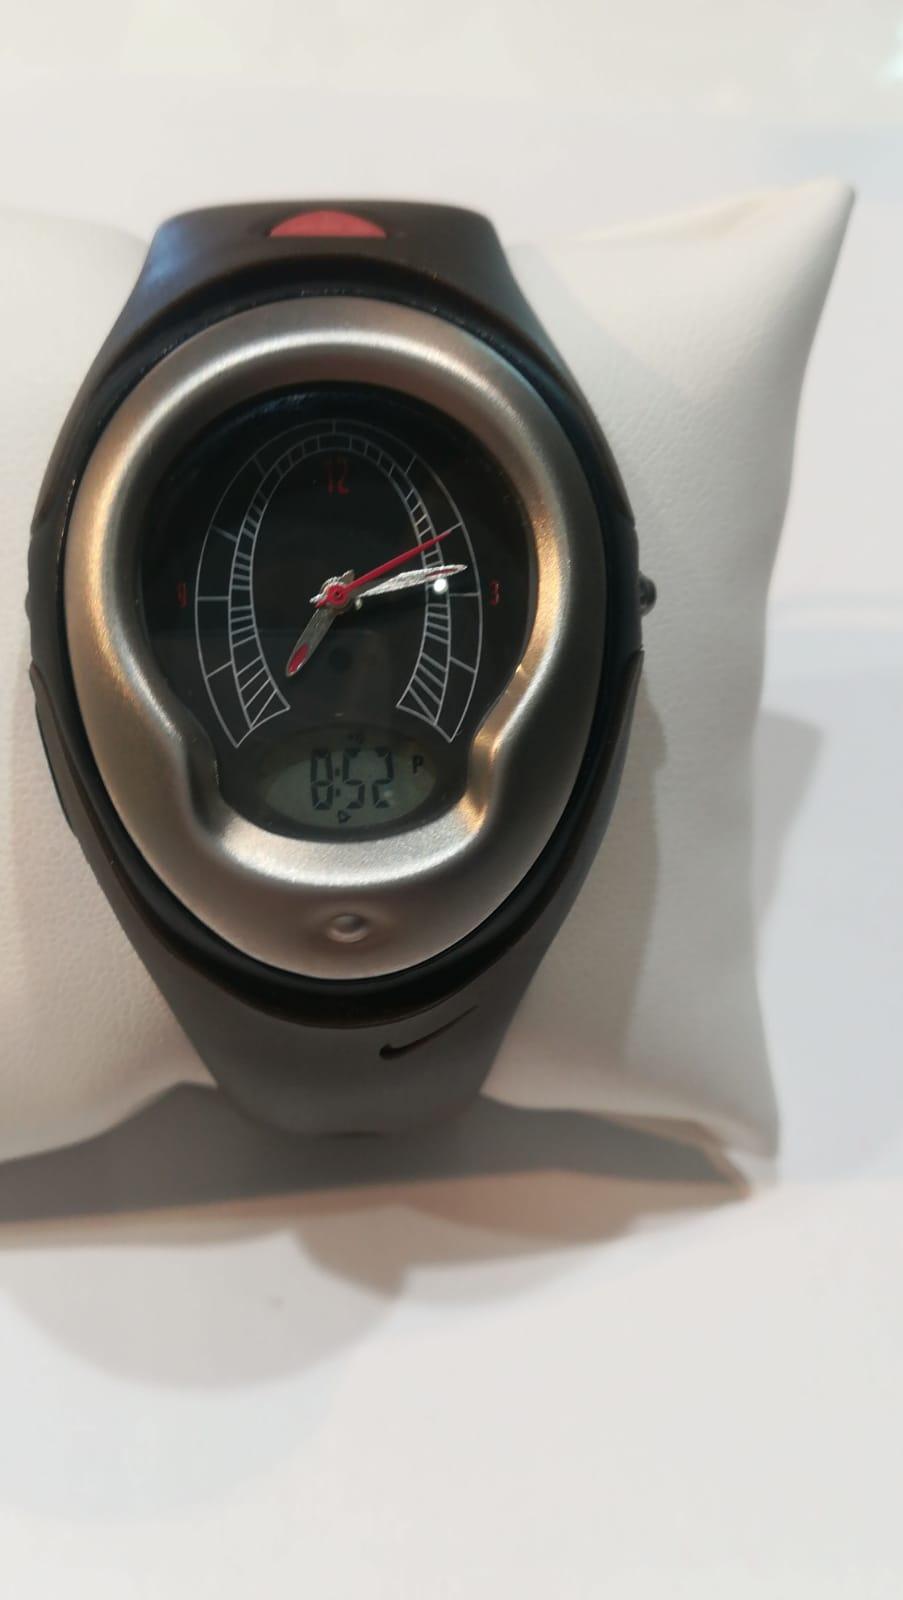 Reloj Nike imagen 1